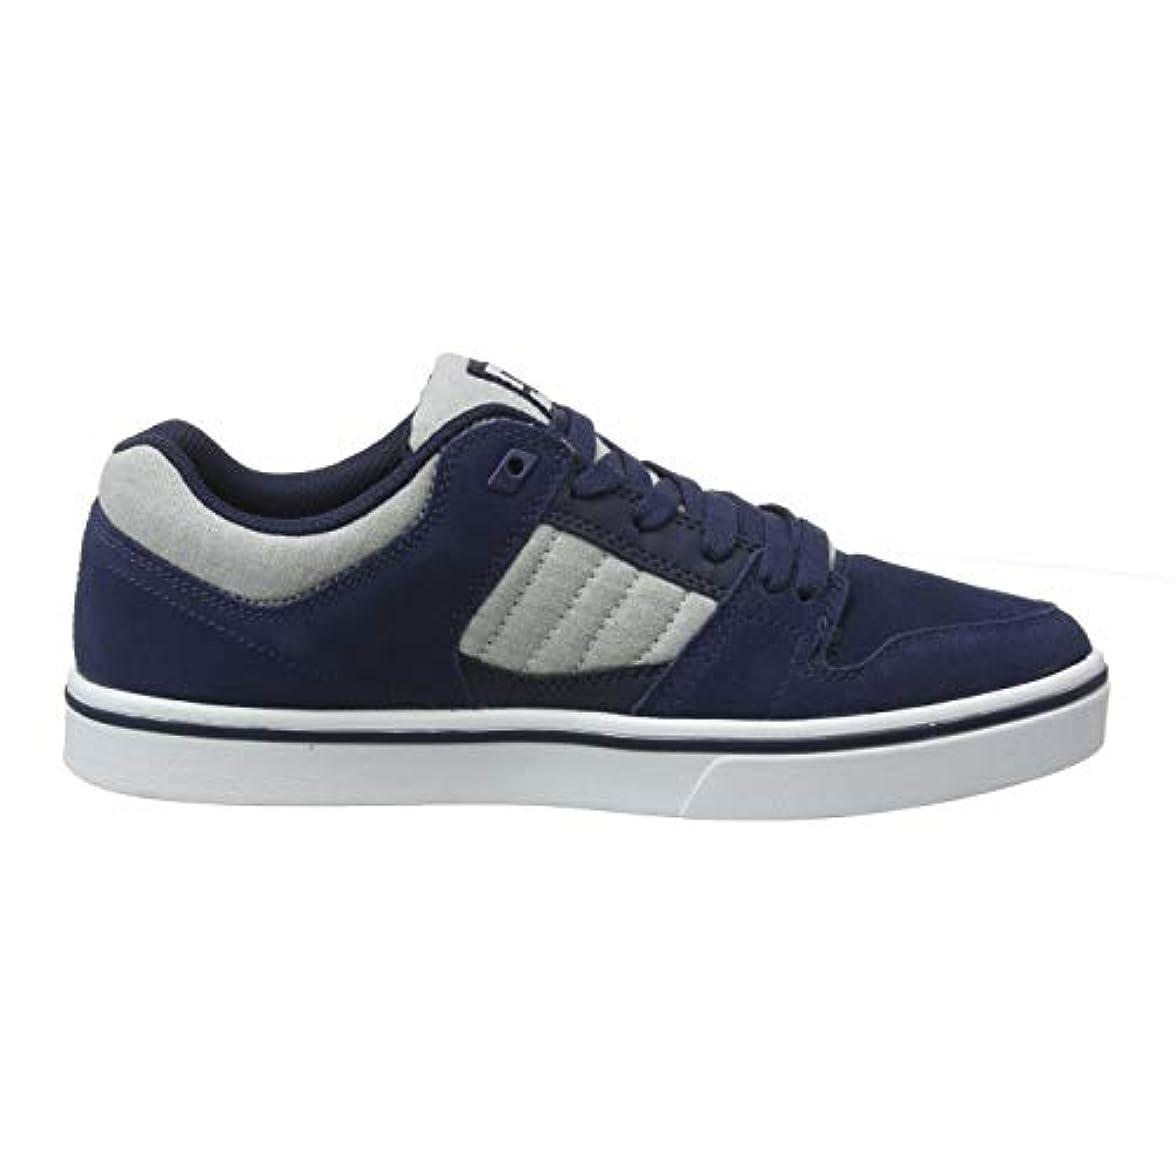 Skateboard Se Shoes Dc Course Da 2 Scarpe Uomo